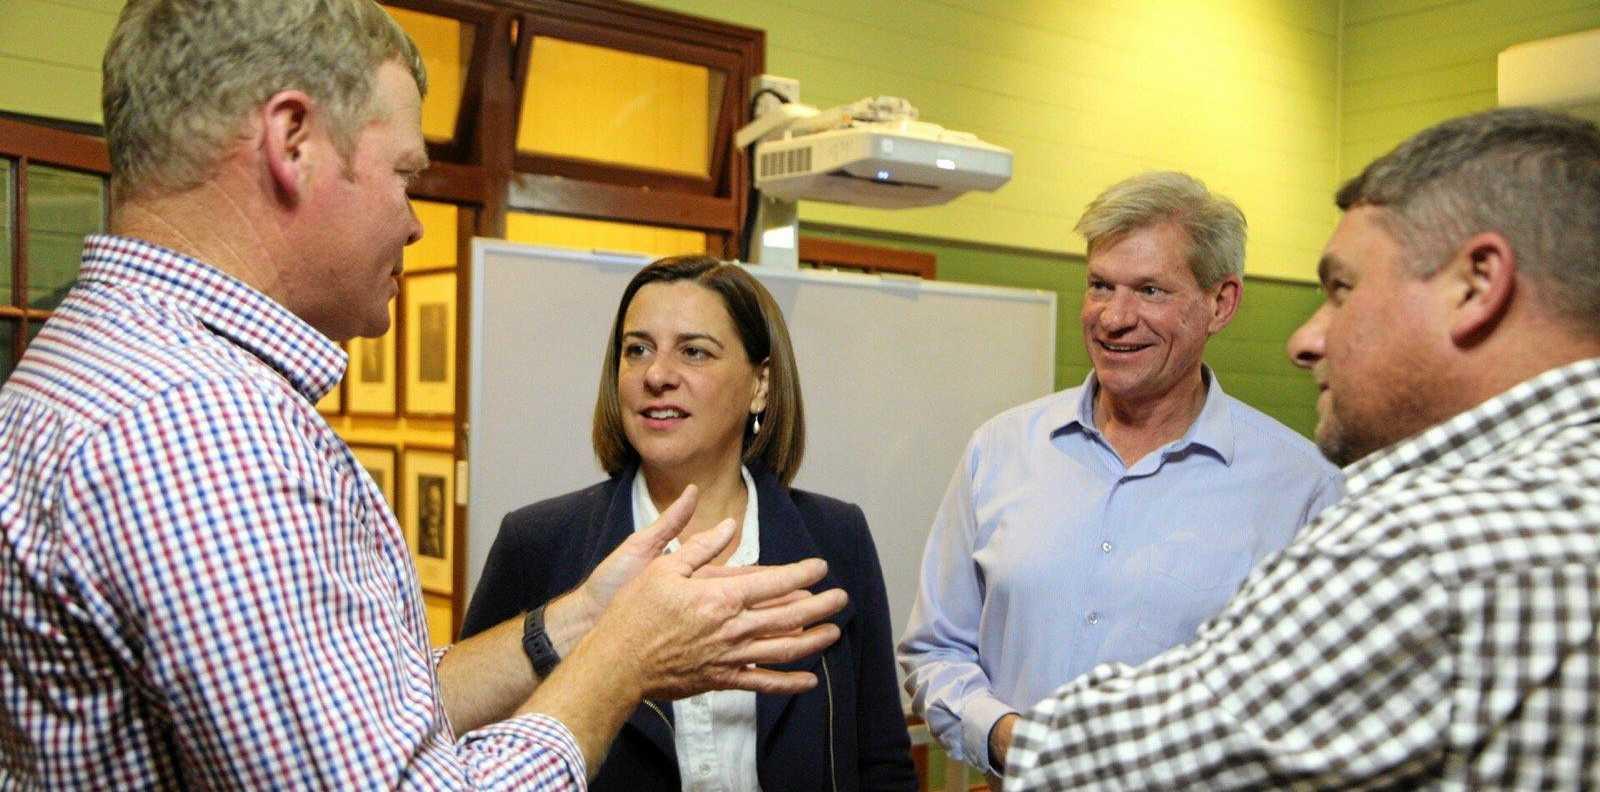 MEETING: Opposition Leader Deb Frecklington speaks to Lockyer Valley Growers president Michael Sippel, Lockyer MP Jim McDonald and Troy Qualischefski.